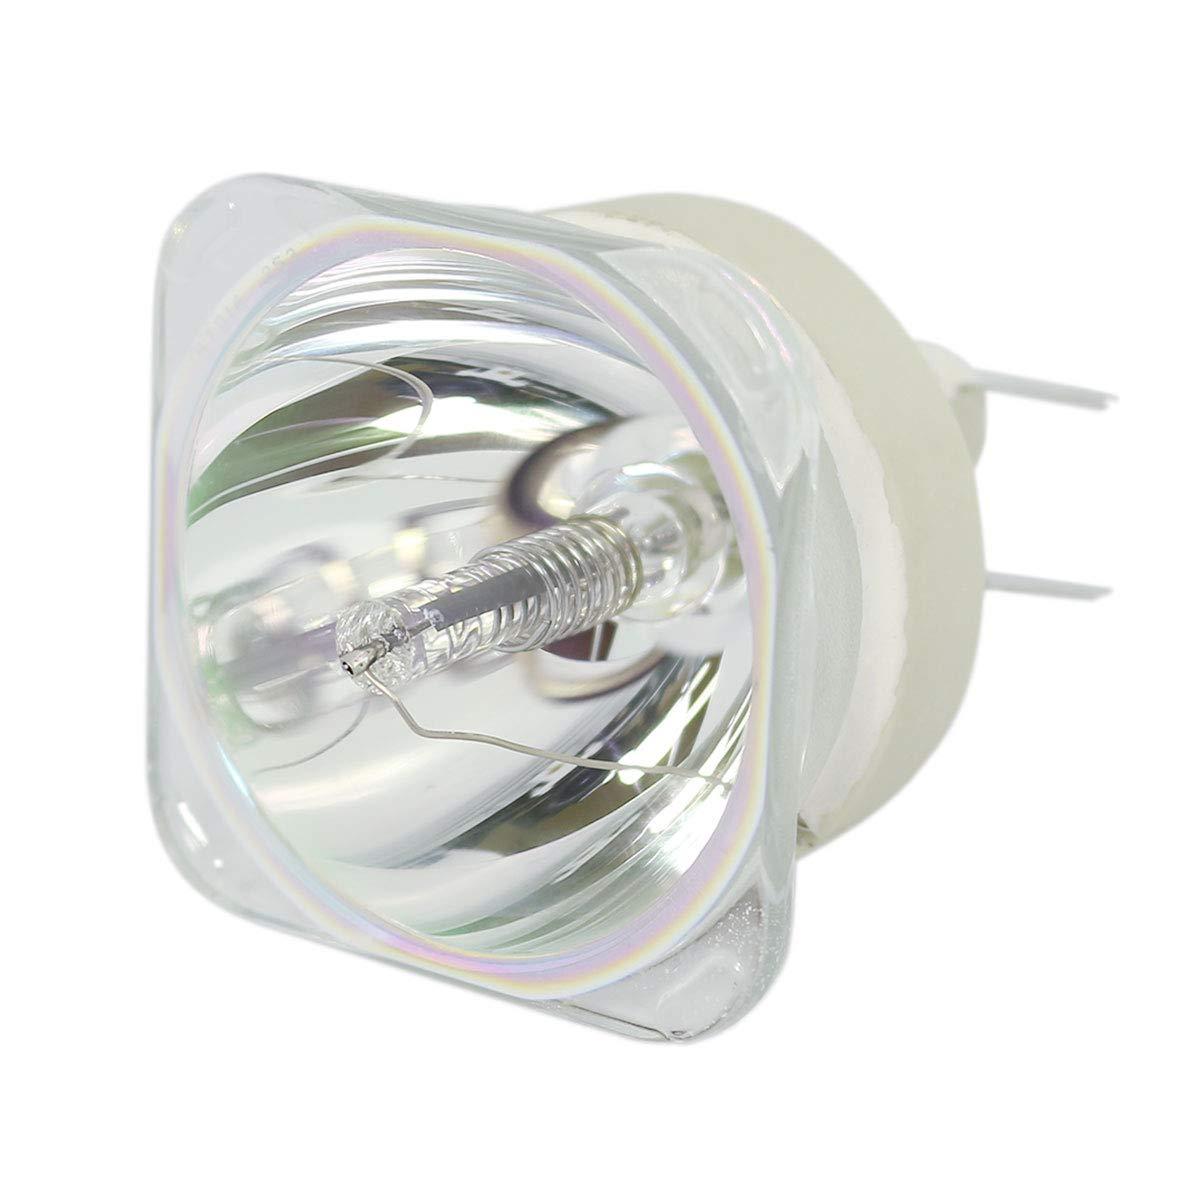 SpArc OEM 交換用ランプ 囲い/電球付き BenQ 5J.J8K05.001用 Economy B07MFH47SV Lamp Only Economy